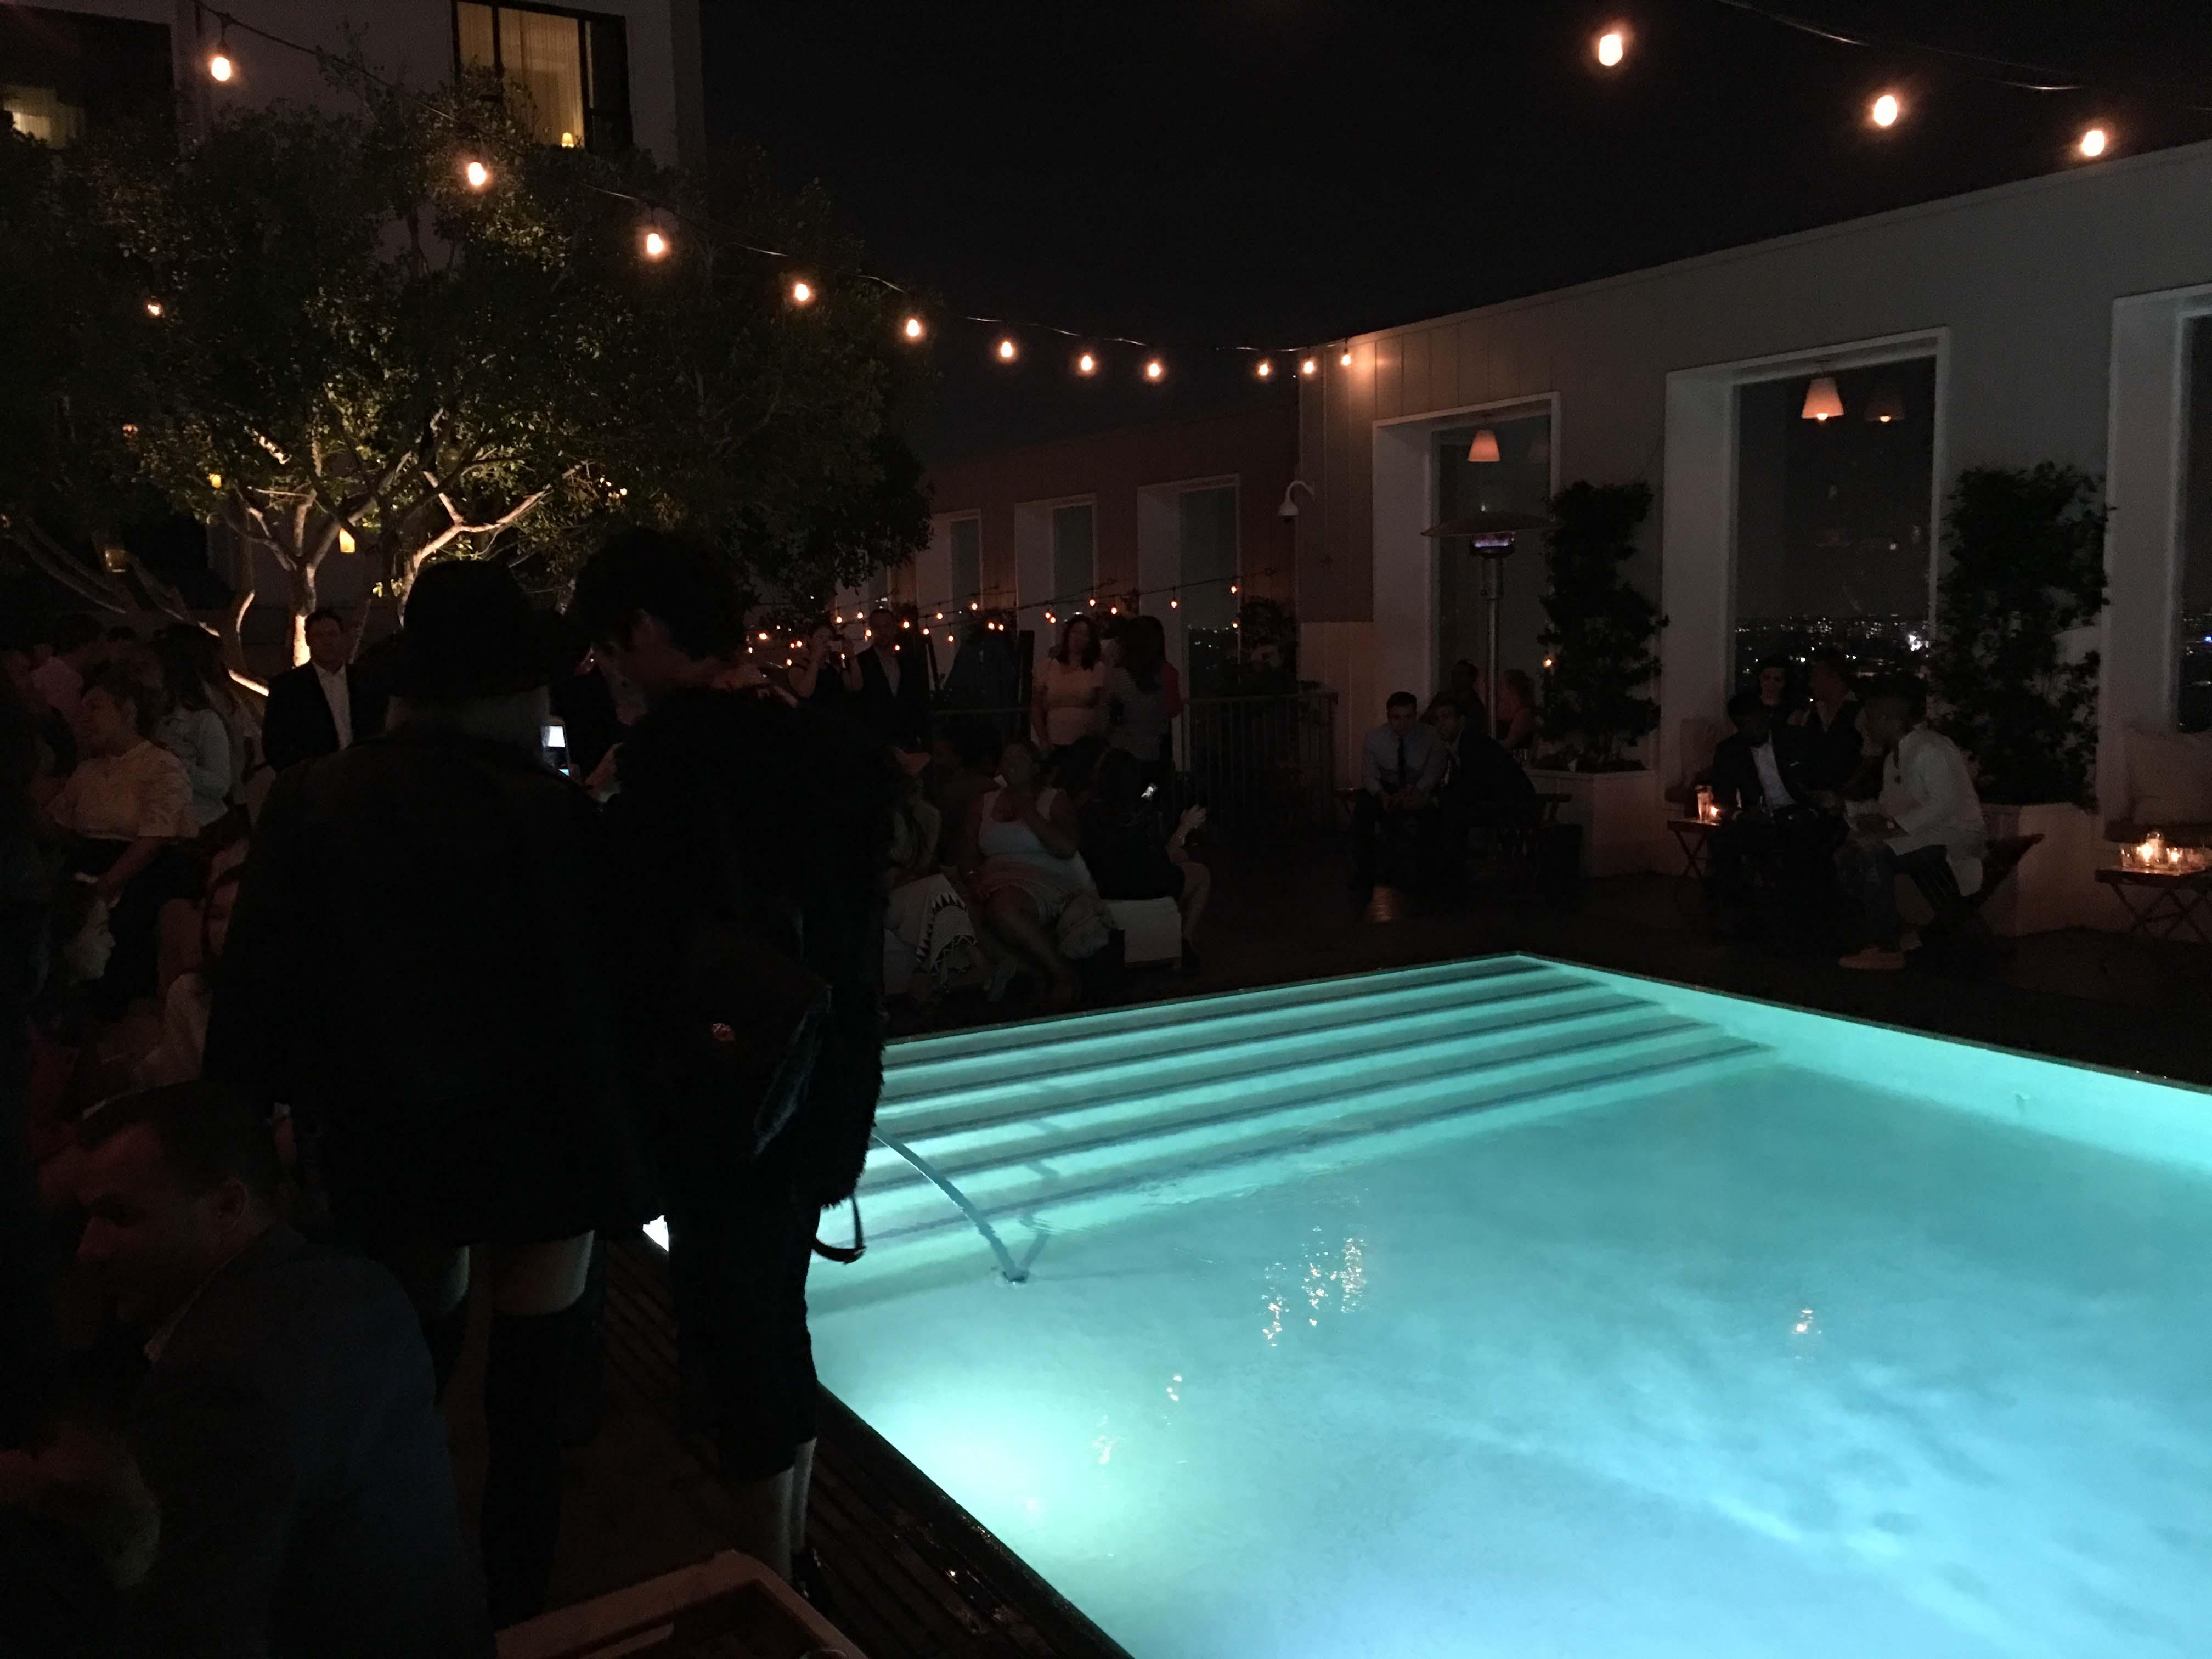 skybar-pool-2016